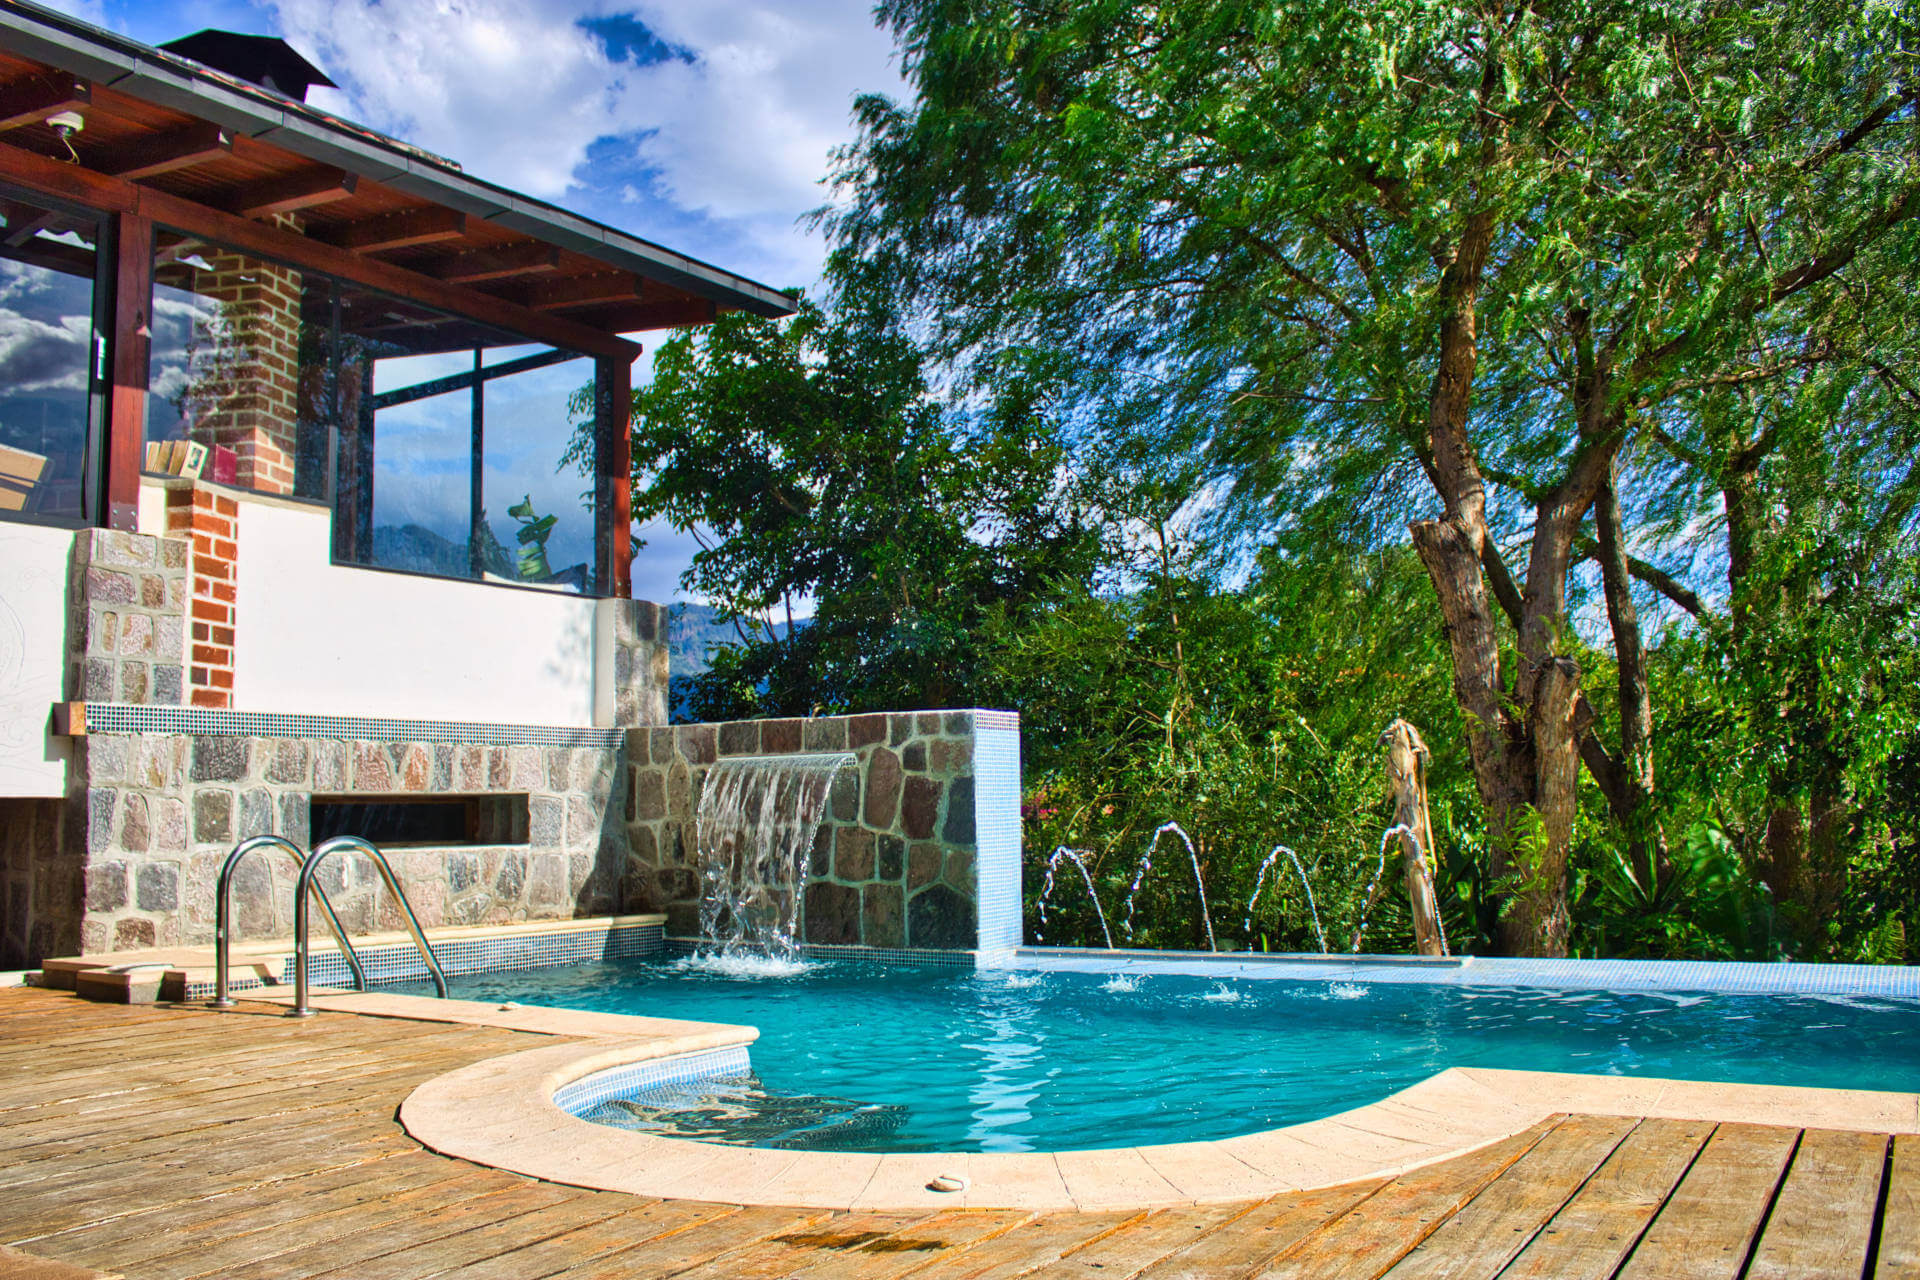 The Casa Lobo Bungalows infinity pool is located in San Pedro la Laguna at the Lake Atitlán in Guatemala.